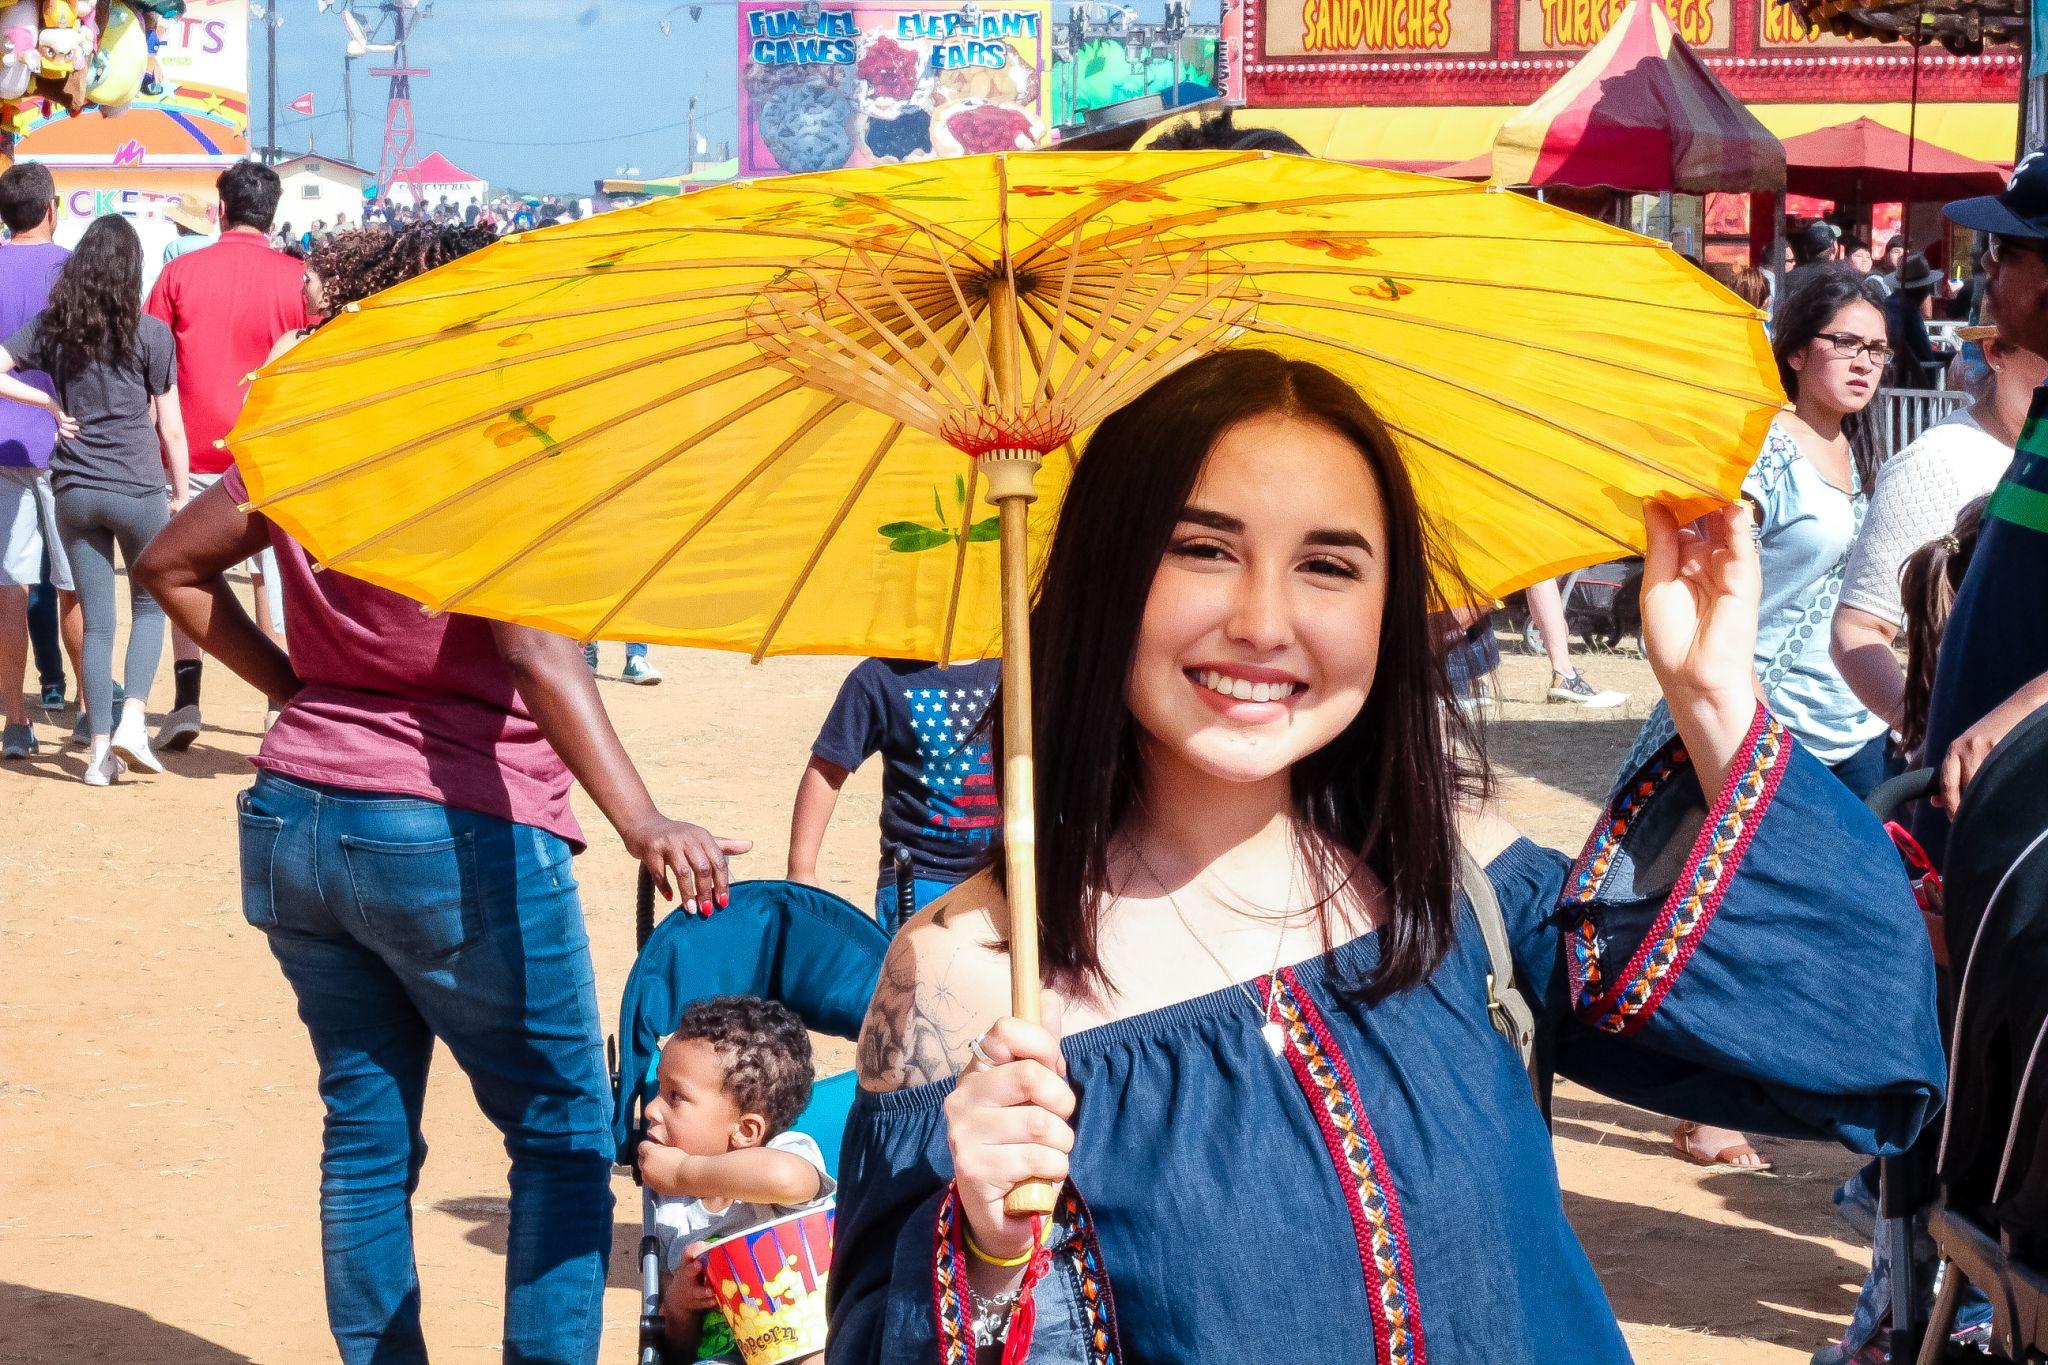 http://www.mysanantonio.com/lifestyle/article/Celebrate-70-years-of-Poteet-Strawberry-Festival-11049391.php#photo-12694667